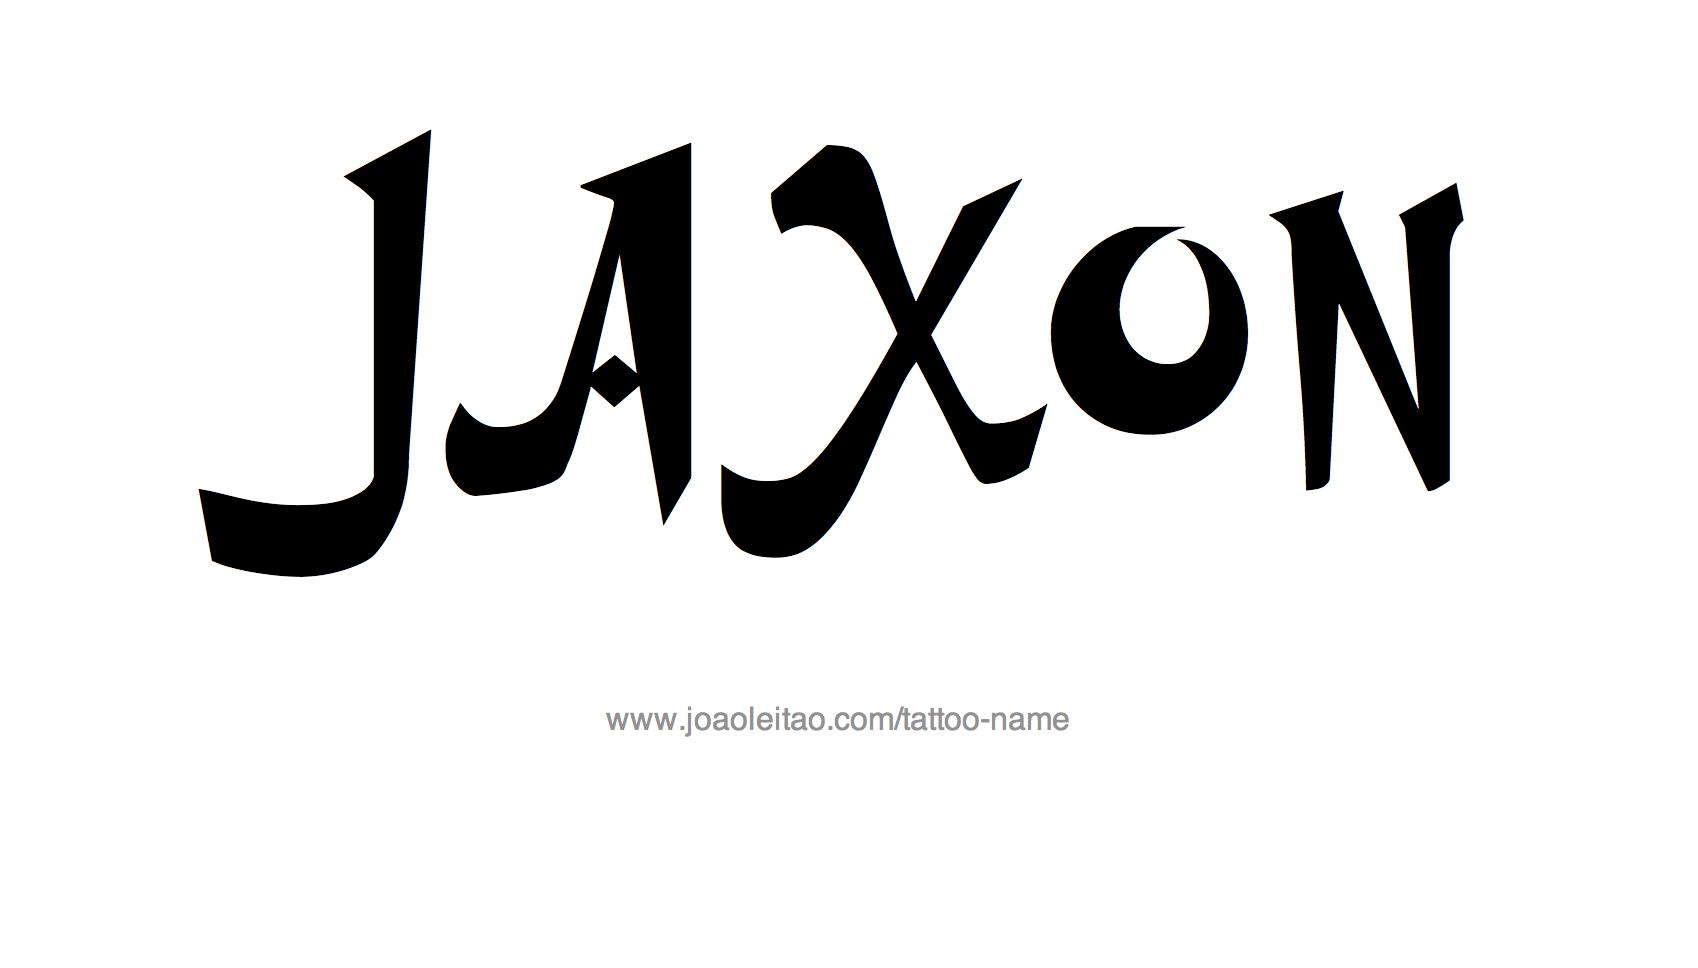 Name: Jaxon Name Tattoo Designs